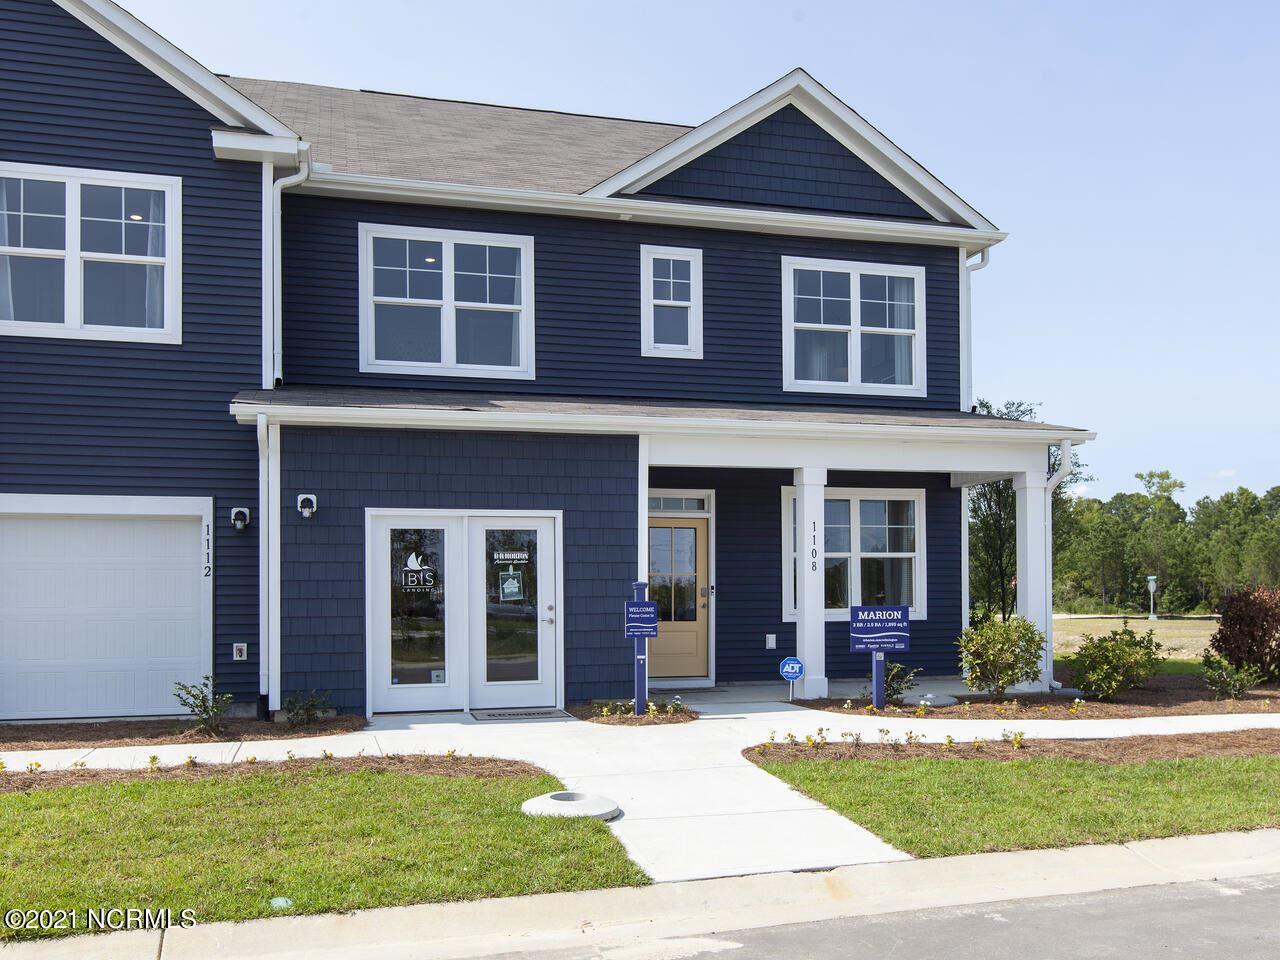 Photo of 7622 Knightbell Circle #Lot 45, Leland, NC 28451 (MLS # 100278410)